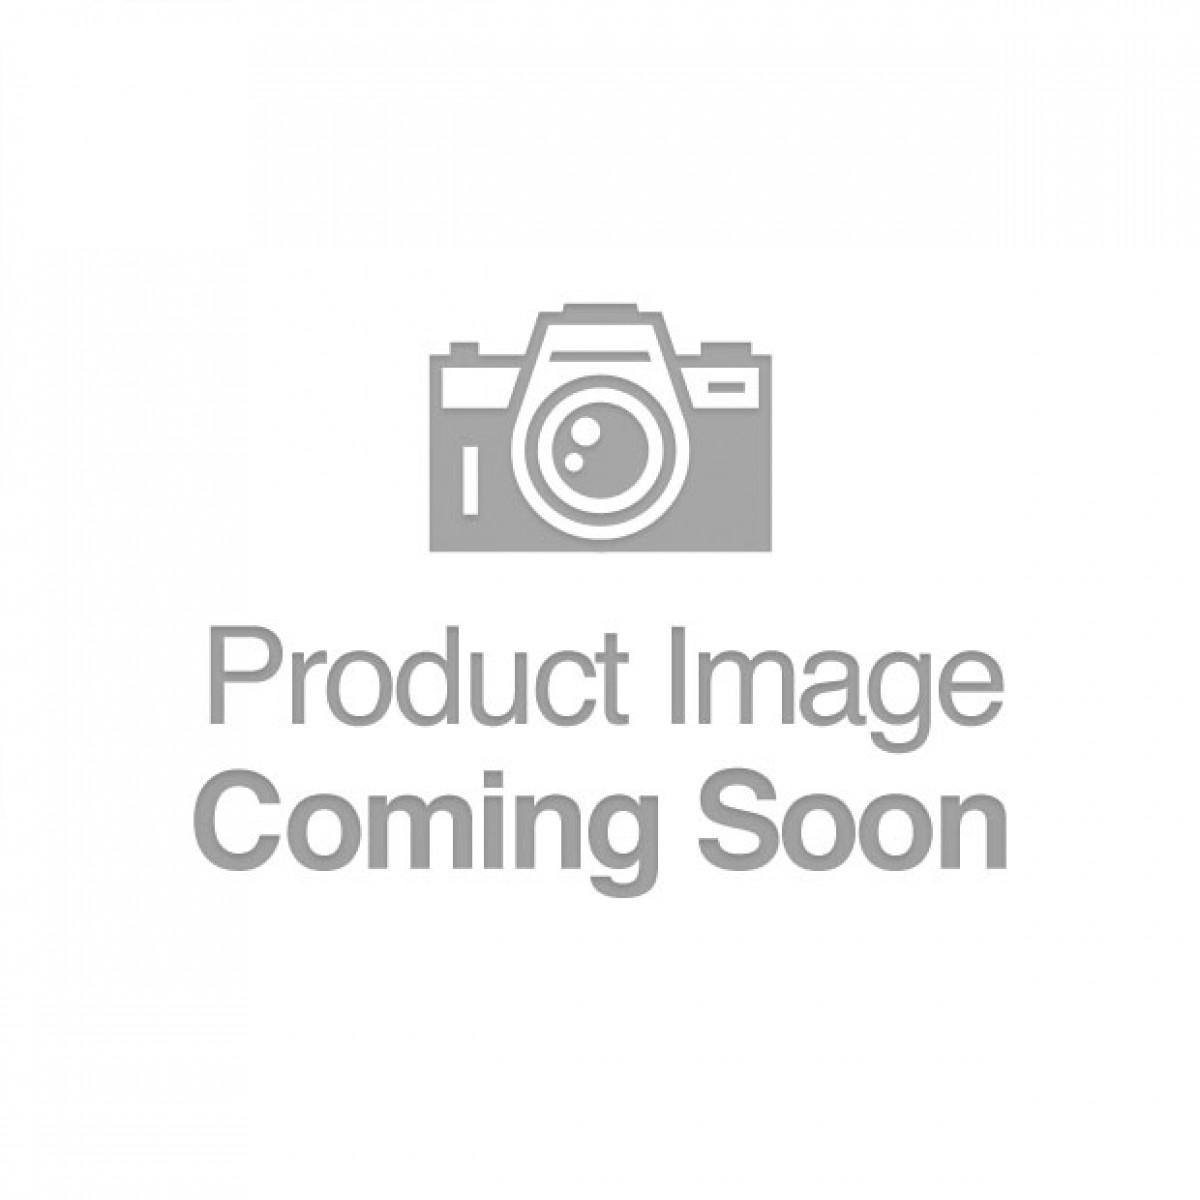 "Shots RealRock Realistic Crystal Clear 7"" Dildo w/Balls - Transparent Clear"